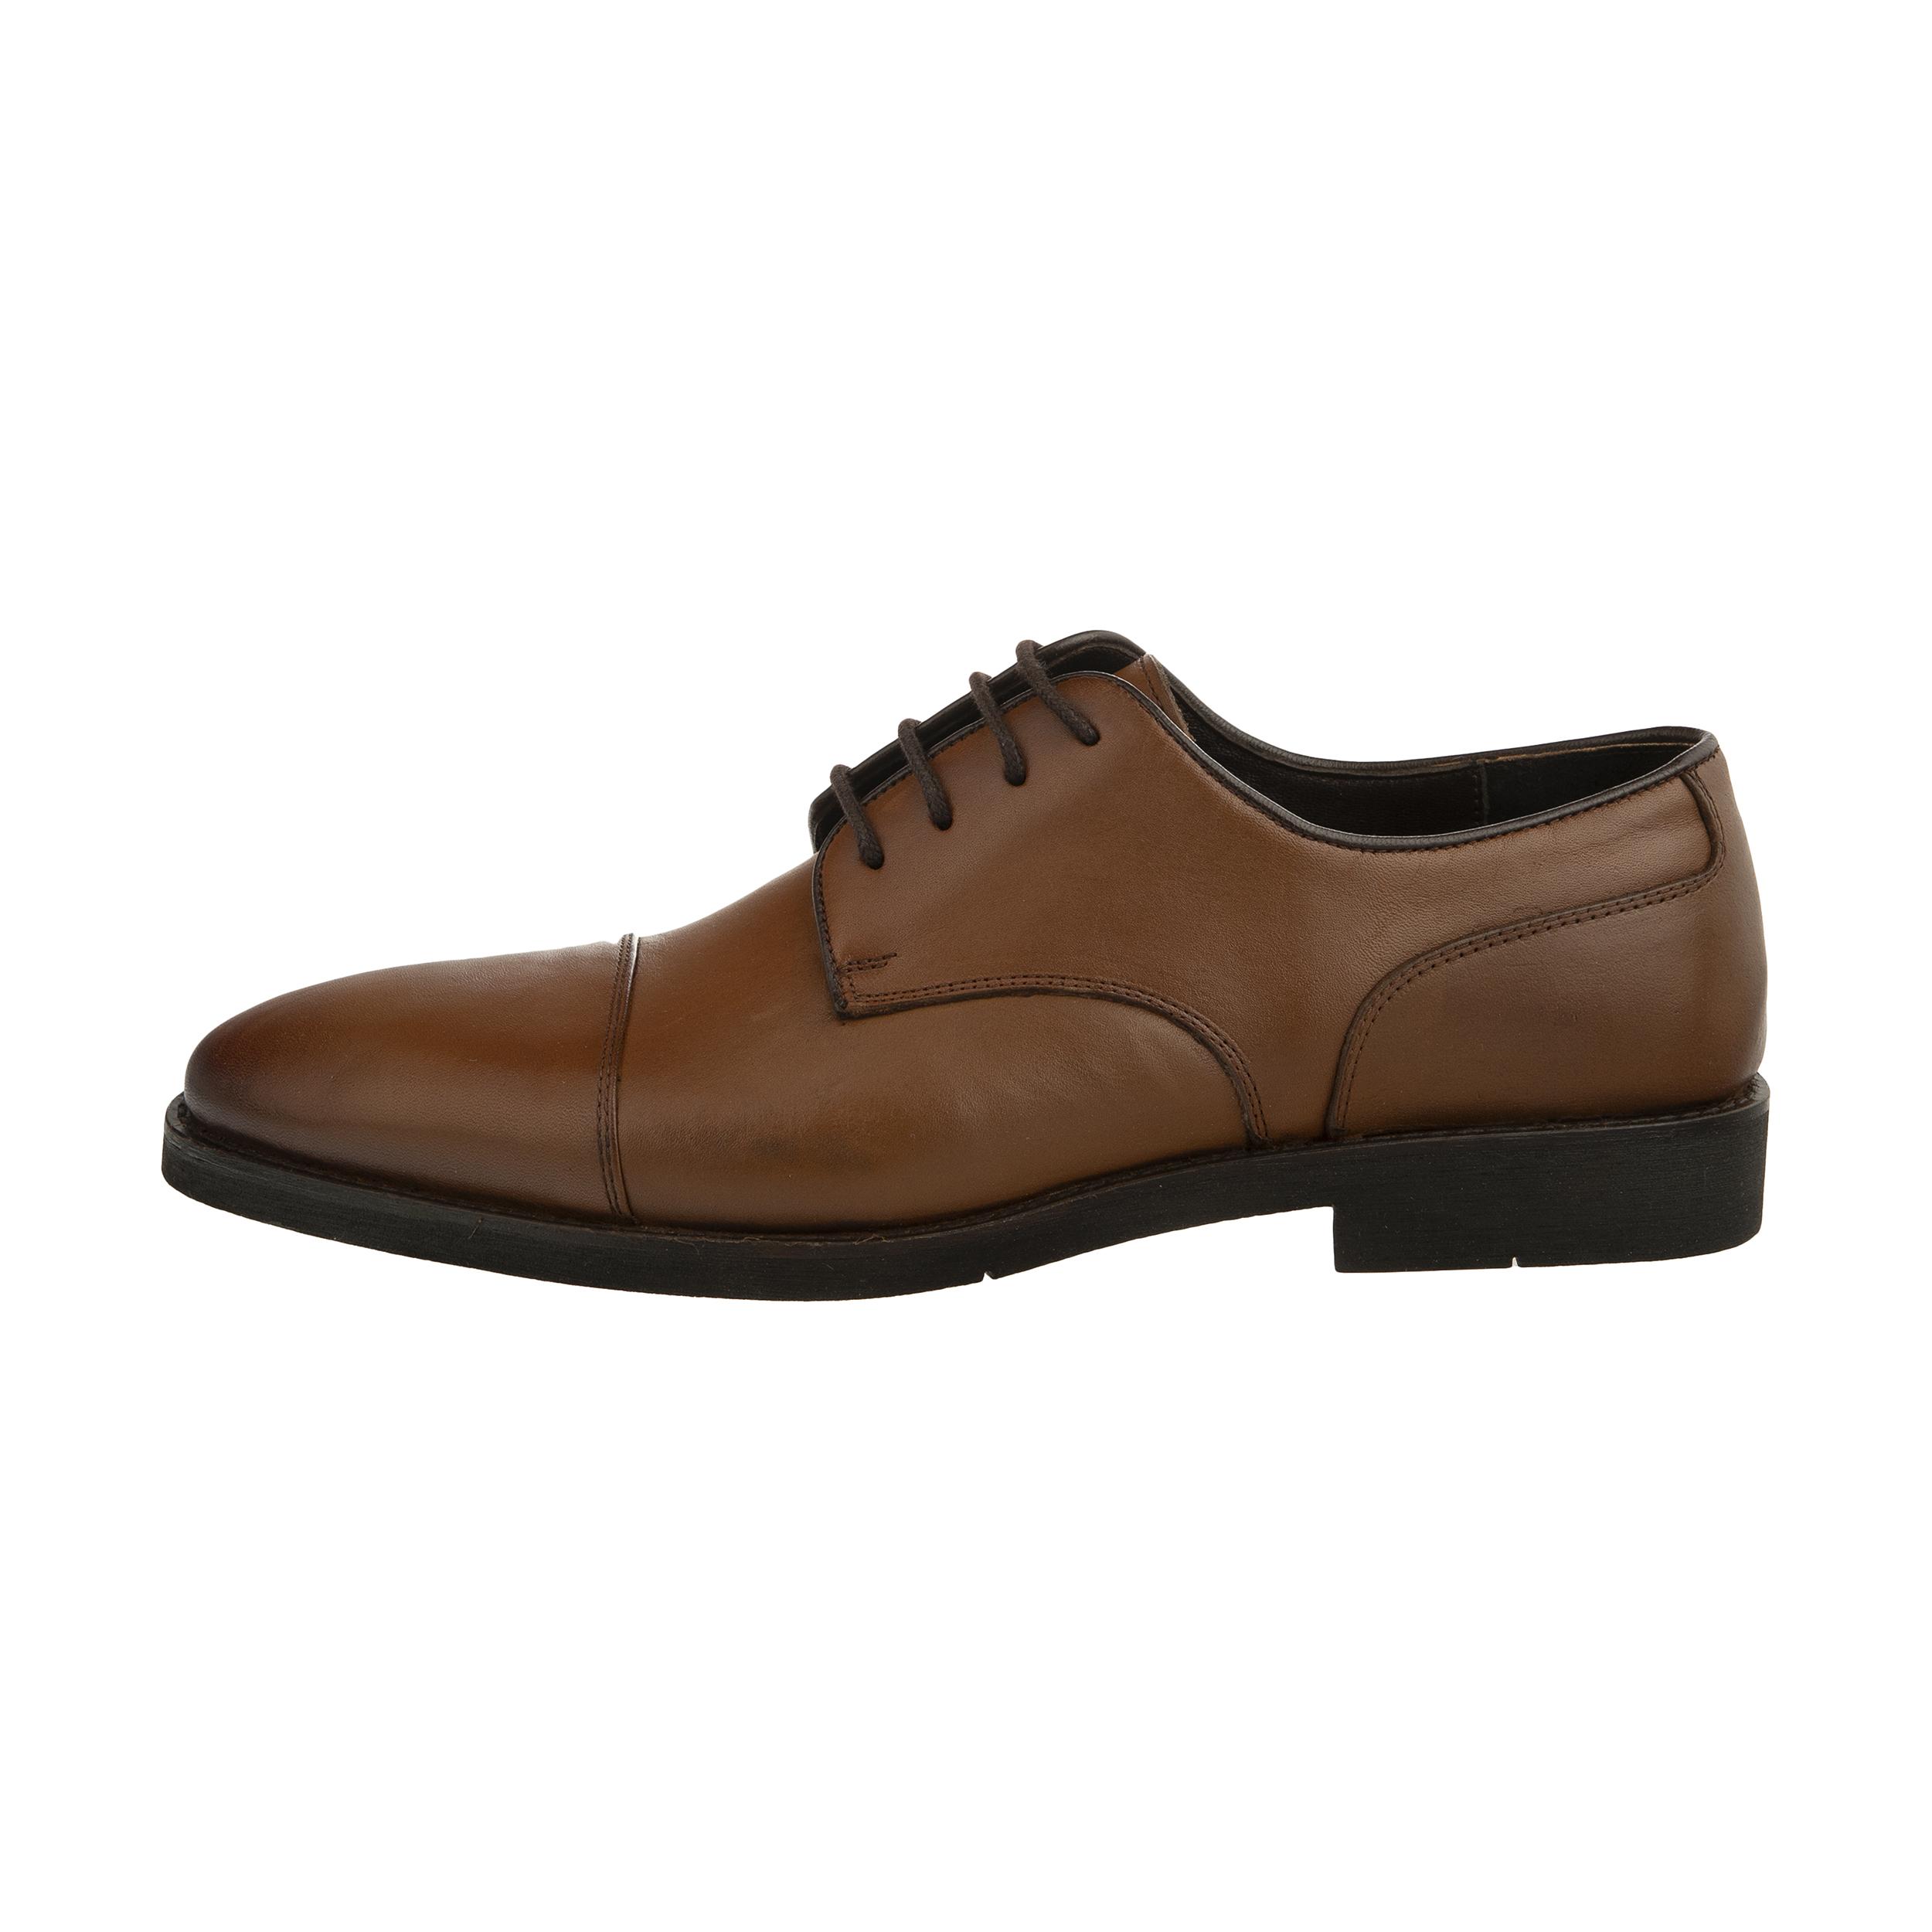 کفش مردانه شیفر مدل 7253E503136